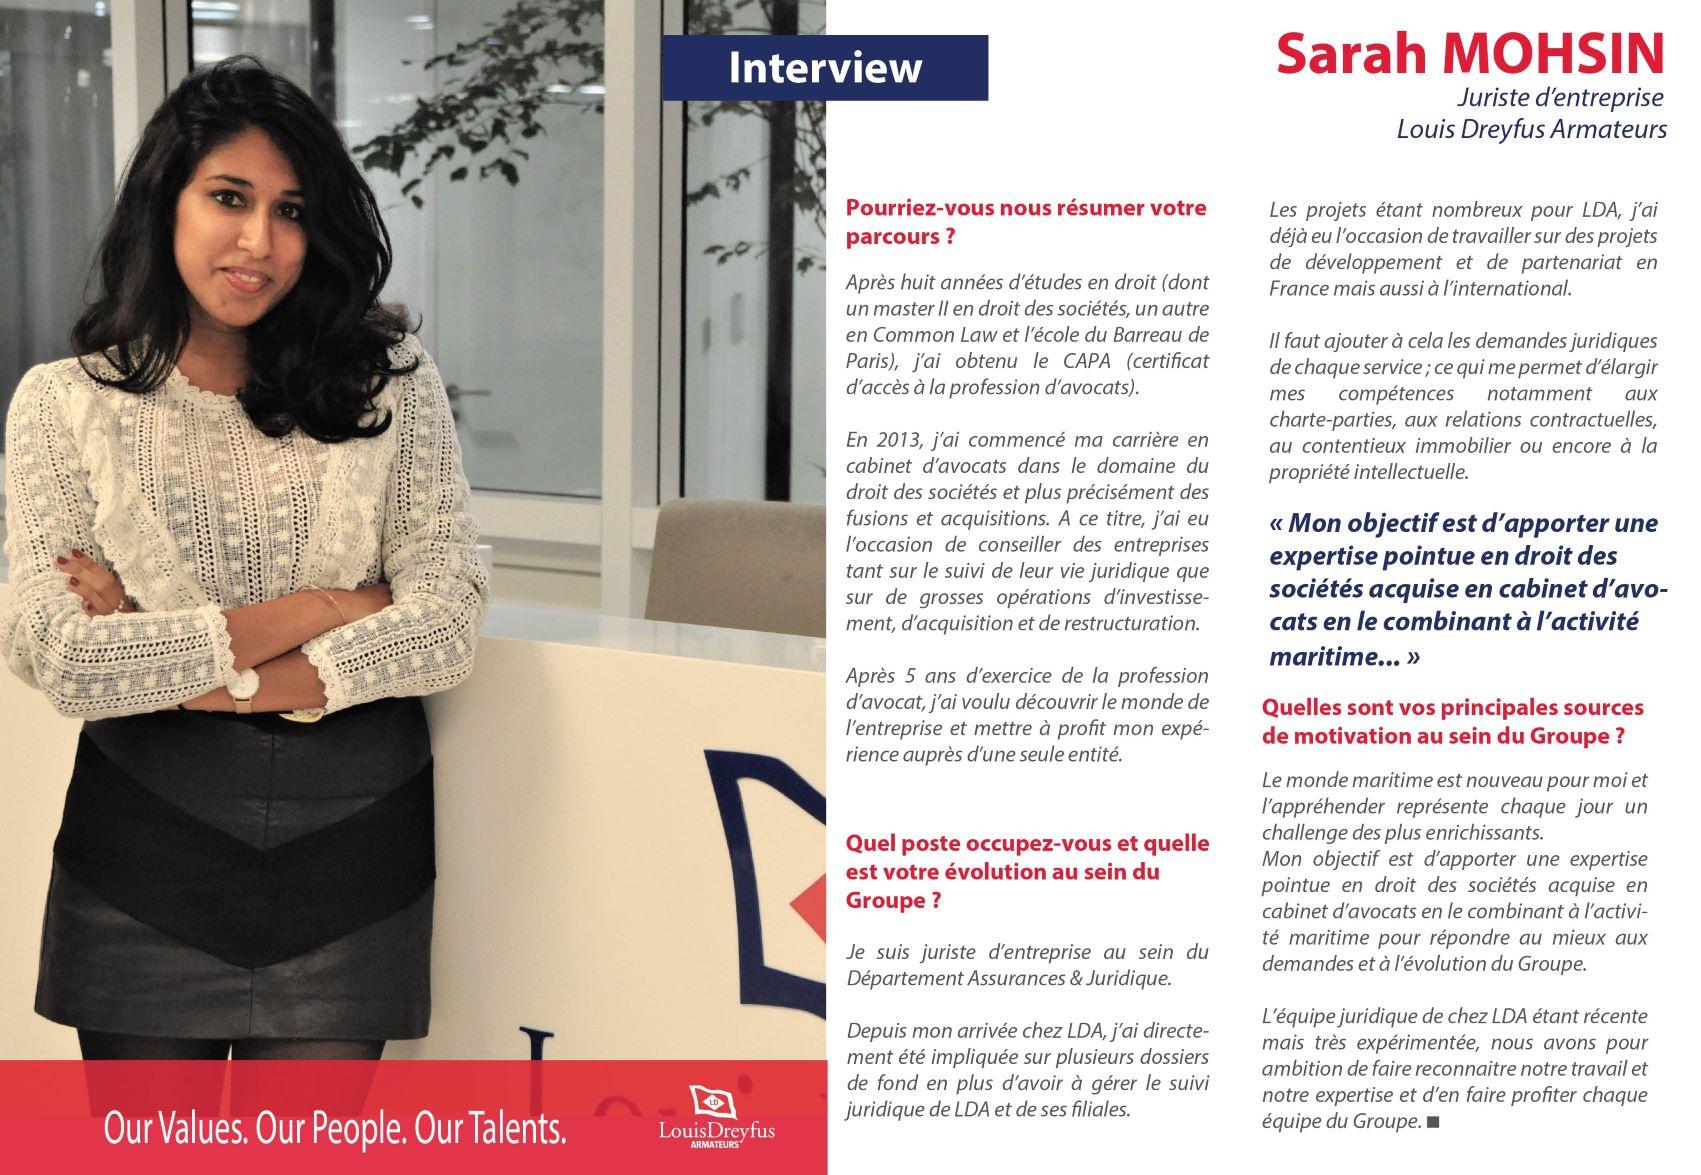 Sarah Mohsin LDA